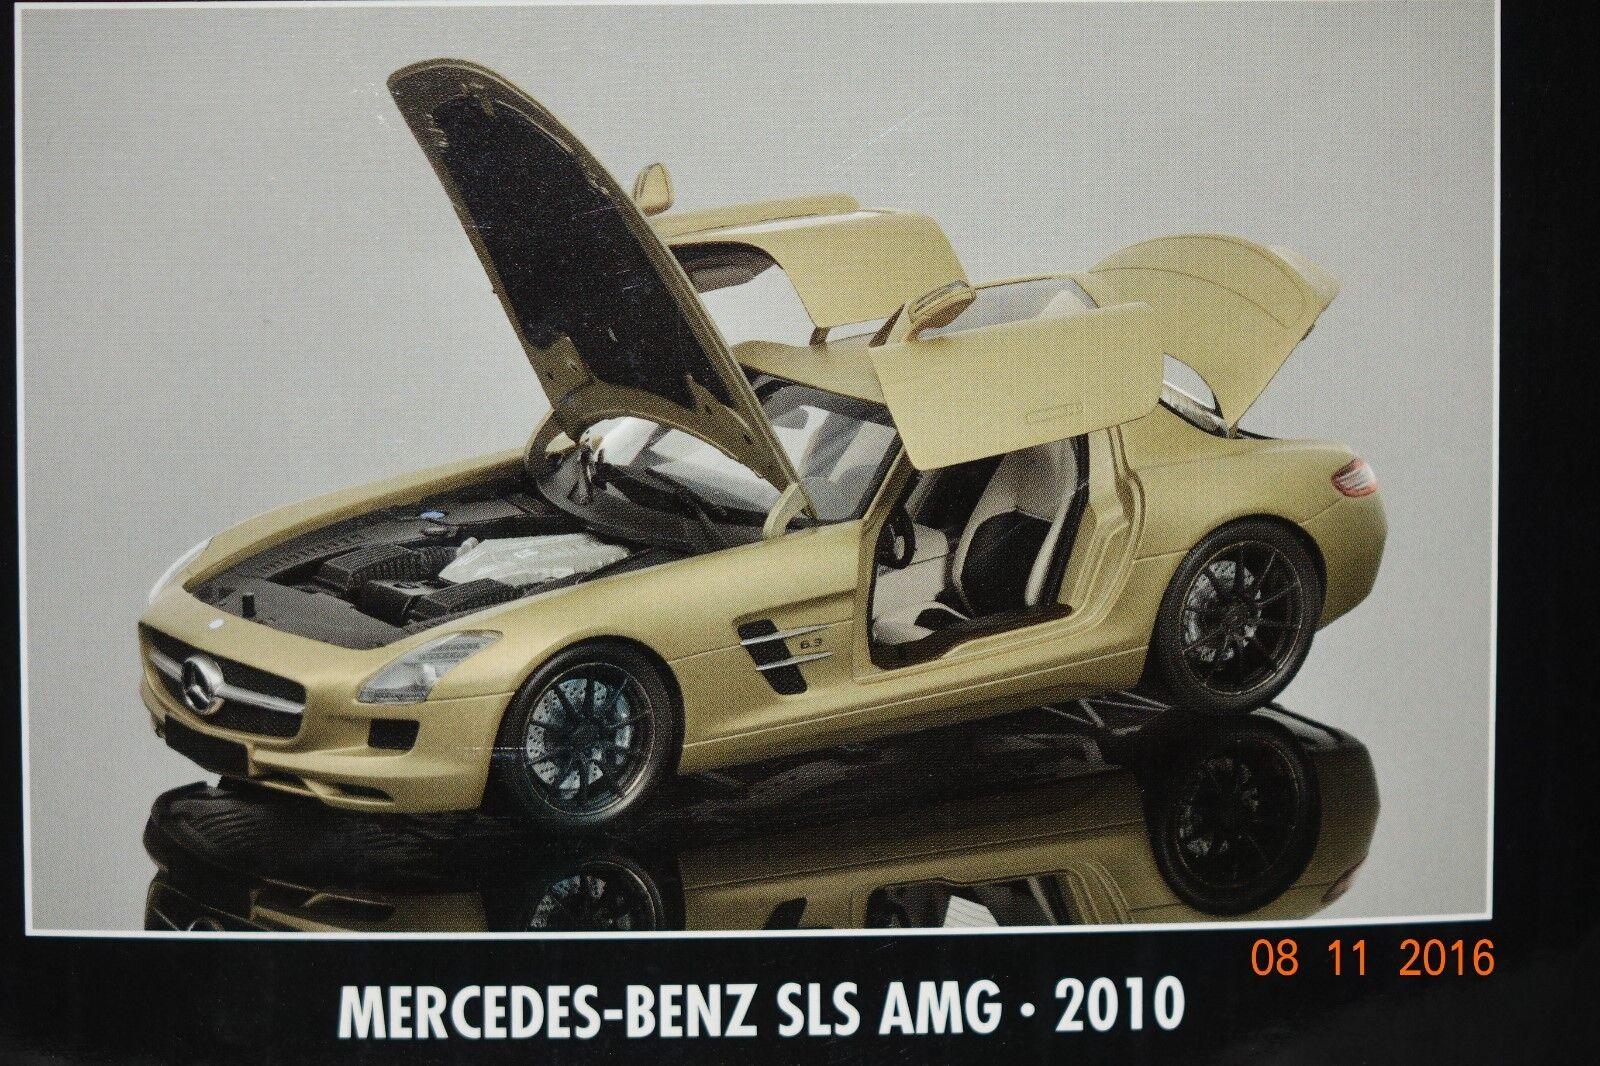 MERCEDES SLS AMG 2010 oro 1 18 Minichamps Nuovo & Ovp 100039024